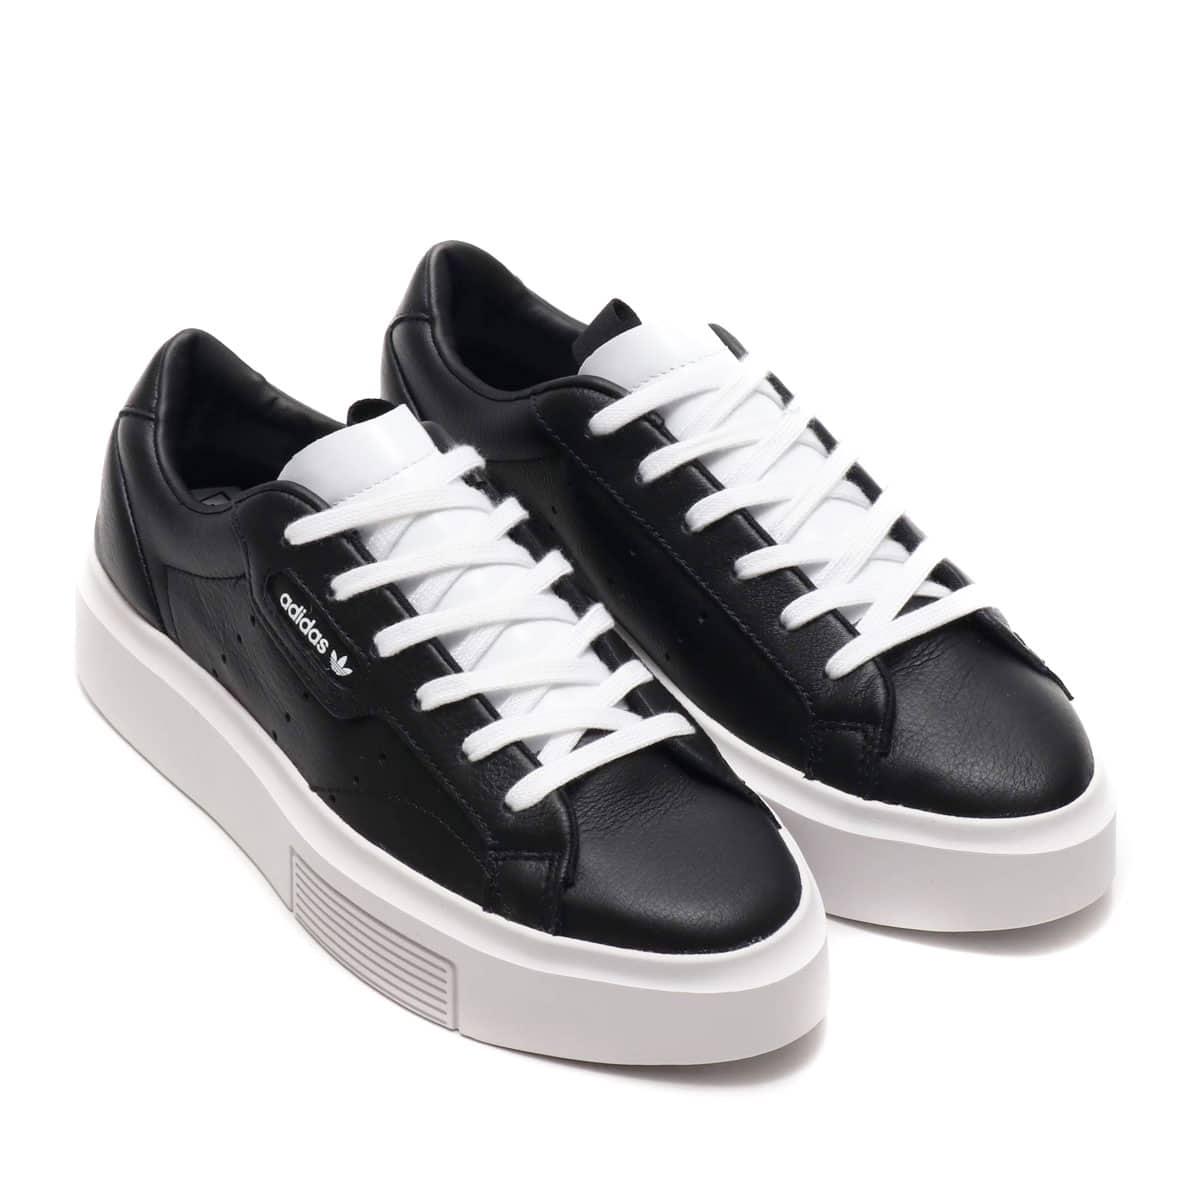 adidas Originals SLEEK SUPER W CORE BLACK/CORE BLACK/RUNNING WHITE 19FW-S_photo_large